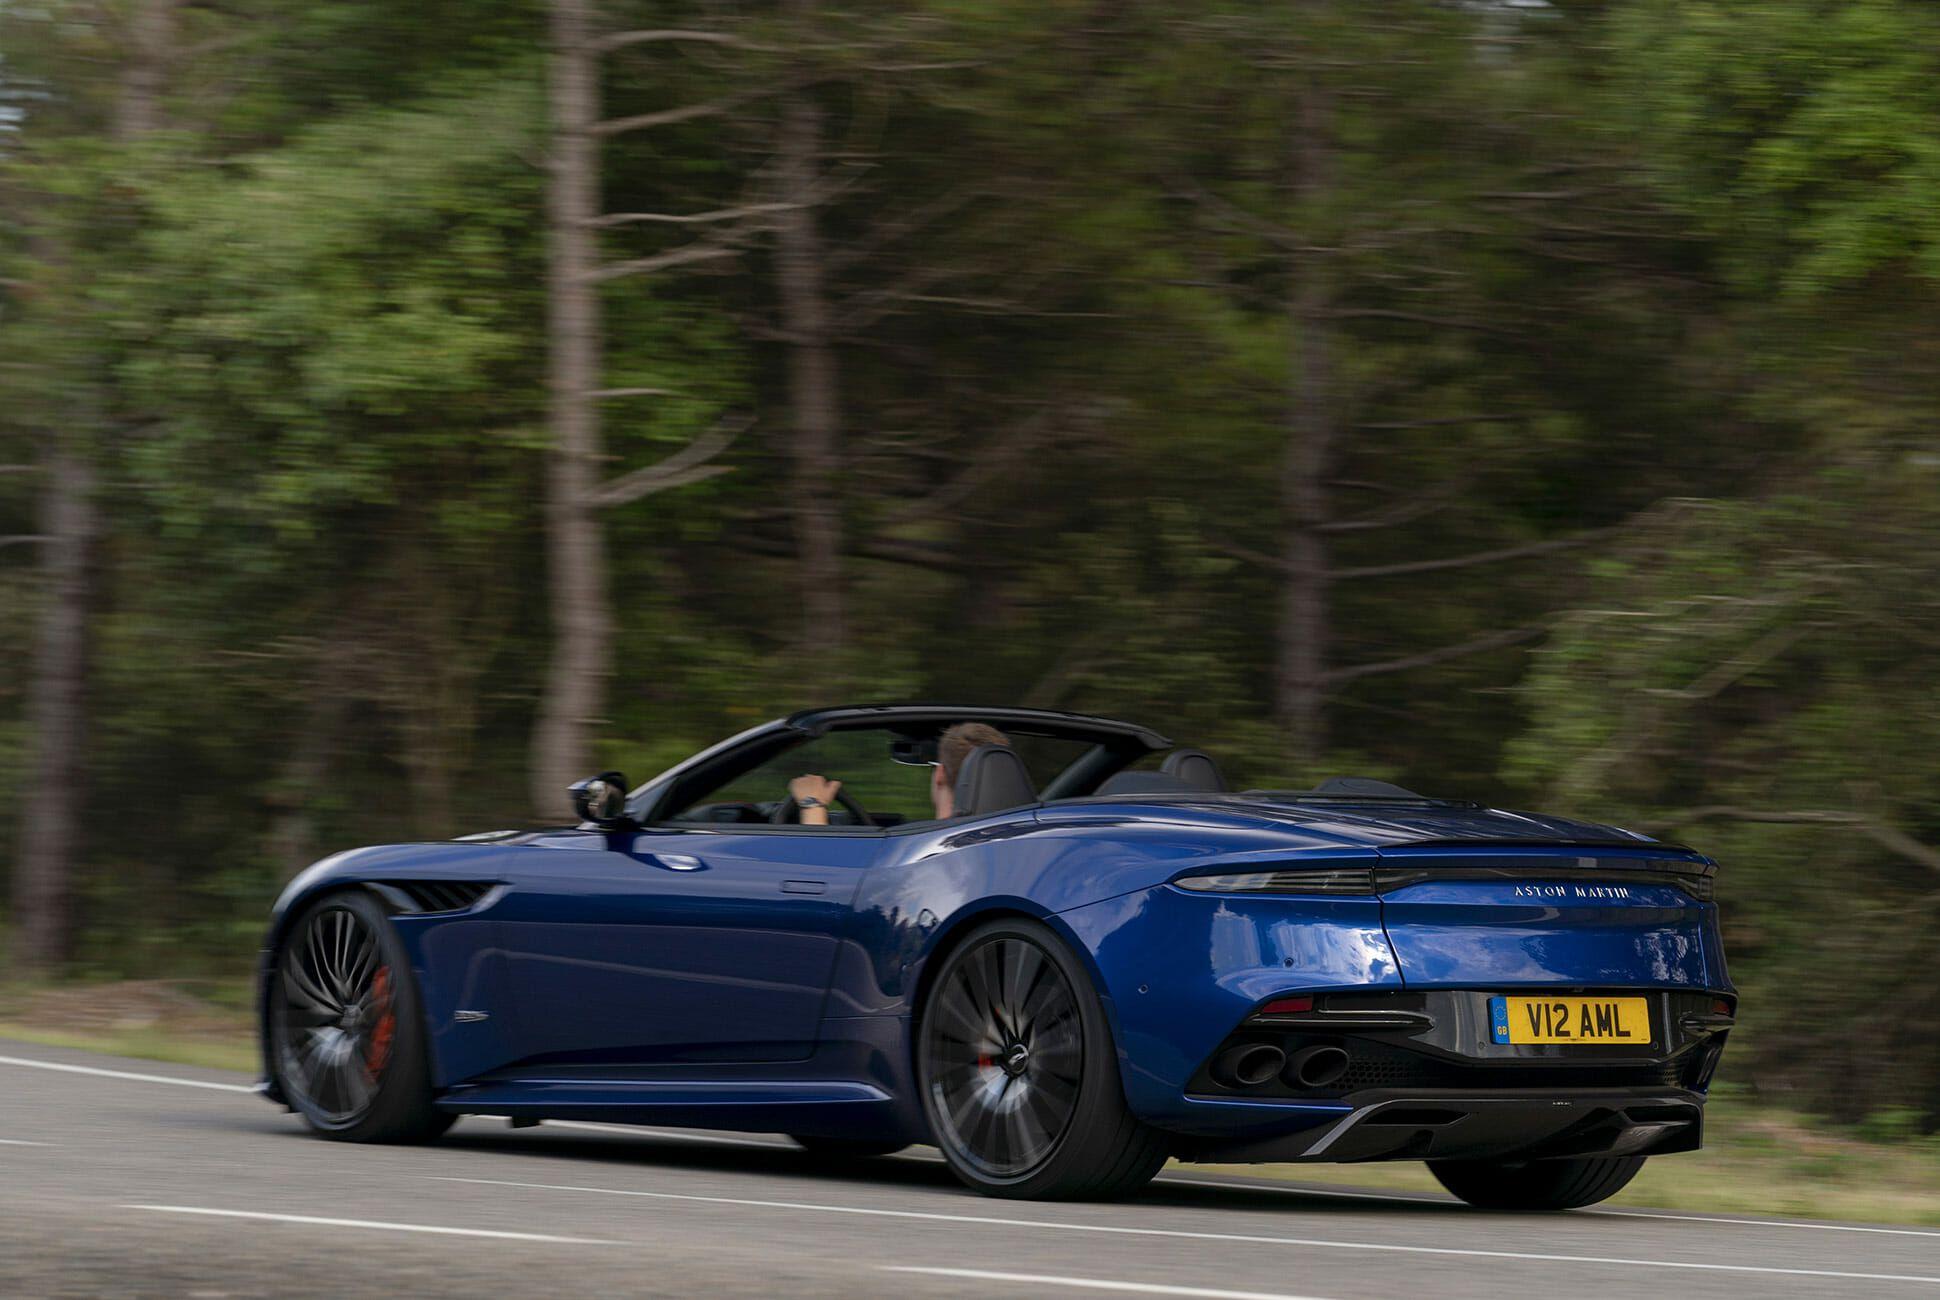 Aston-Martin-DBS-Superleggera-Volante-Review-gear-patrol-slide-5